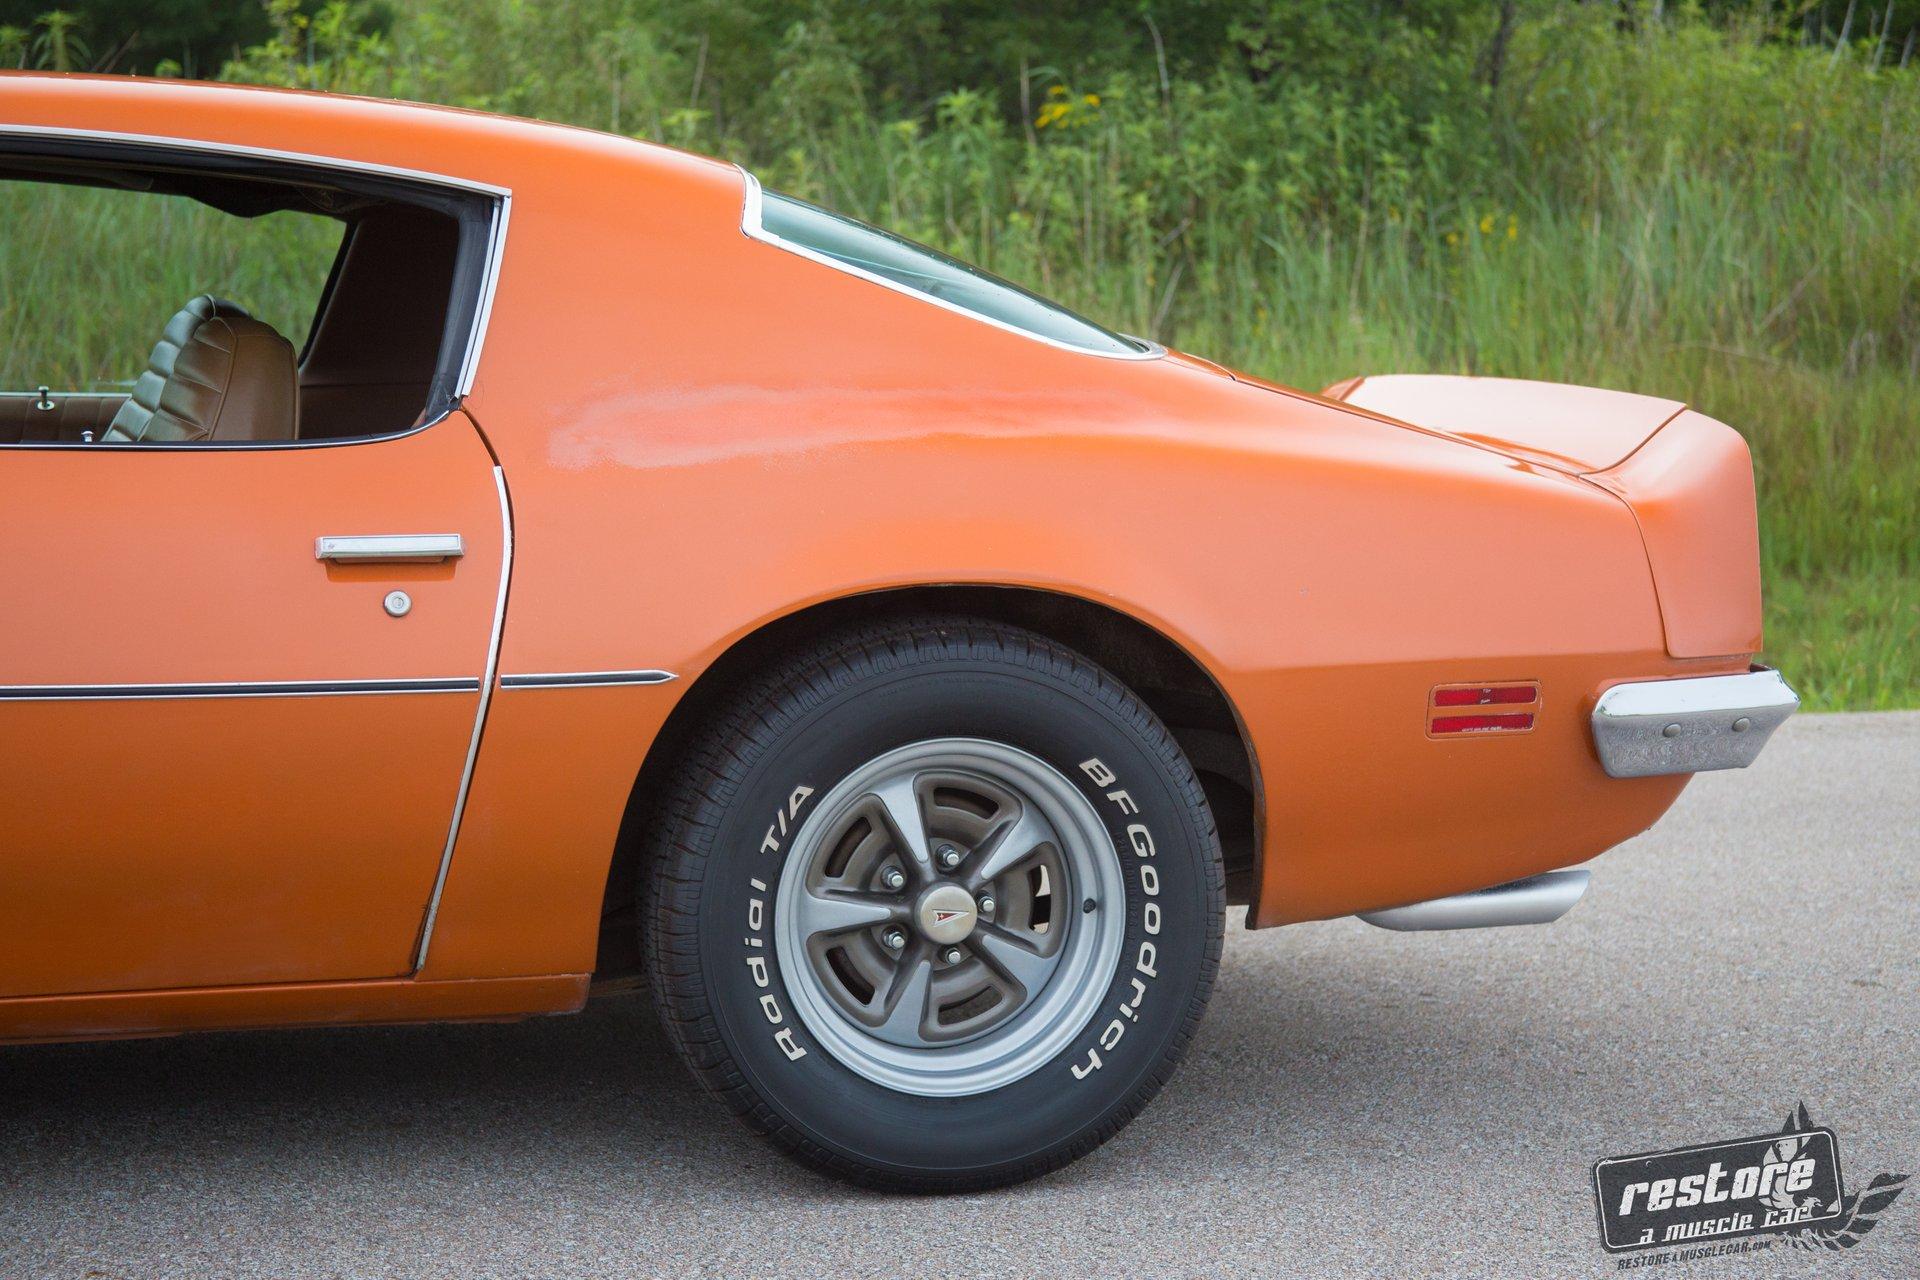 1973 Pontiac Formula   Restore A Muscle Car™ LLC